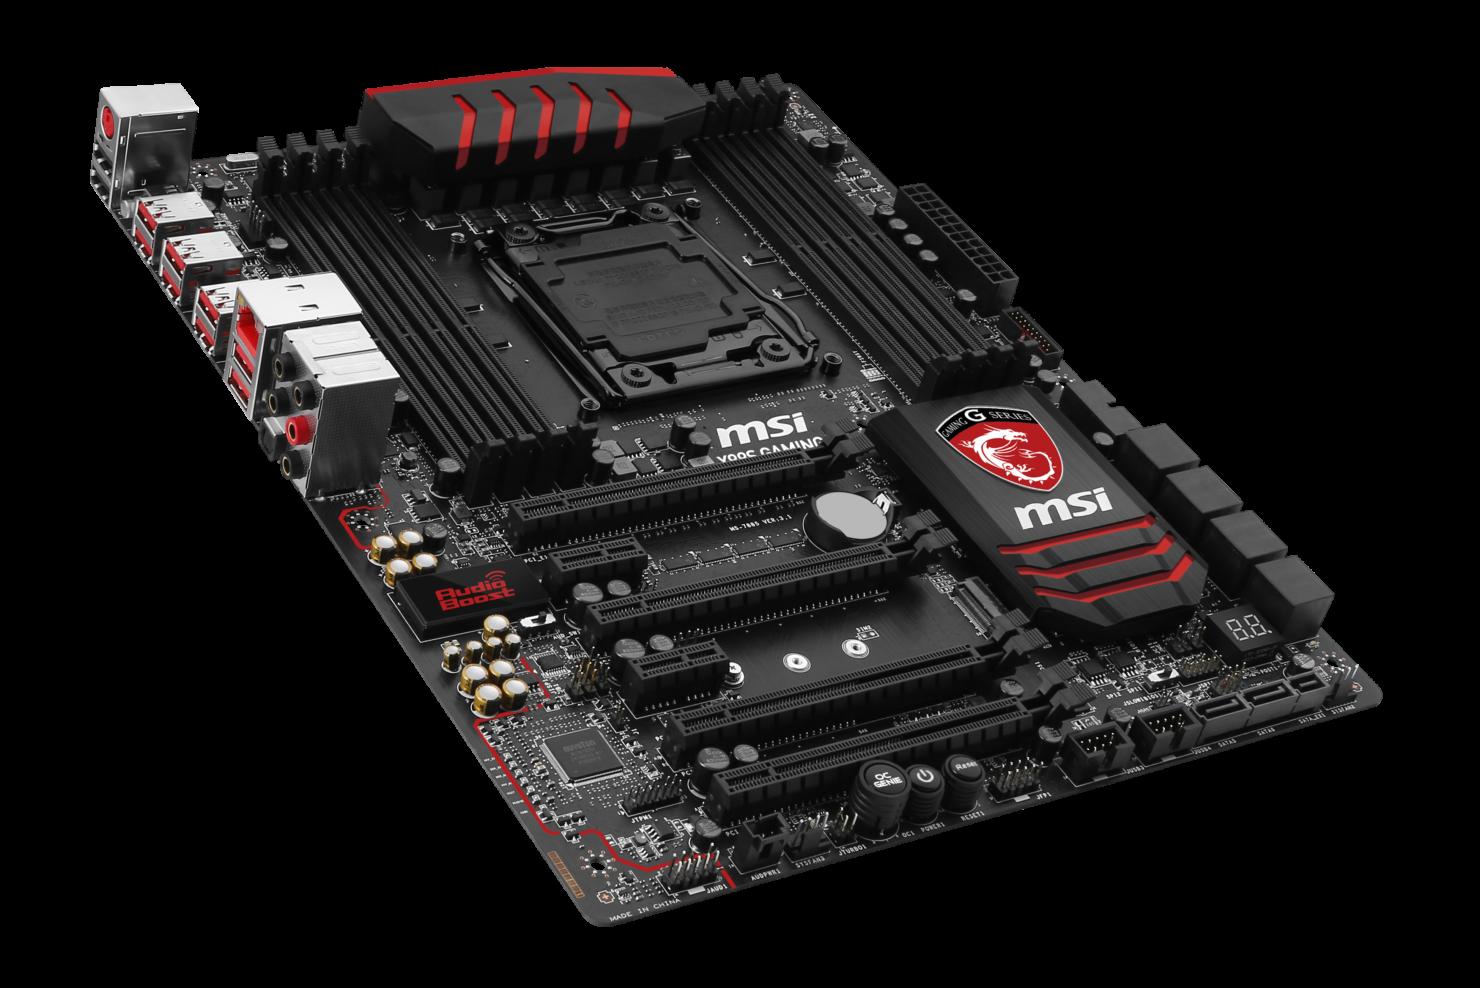 msi-x99s-gaming-7-motherboard_1